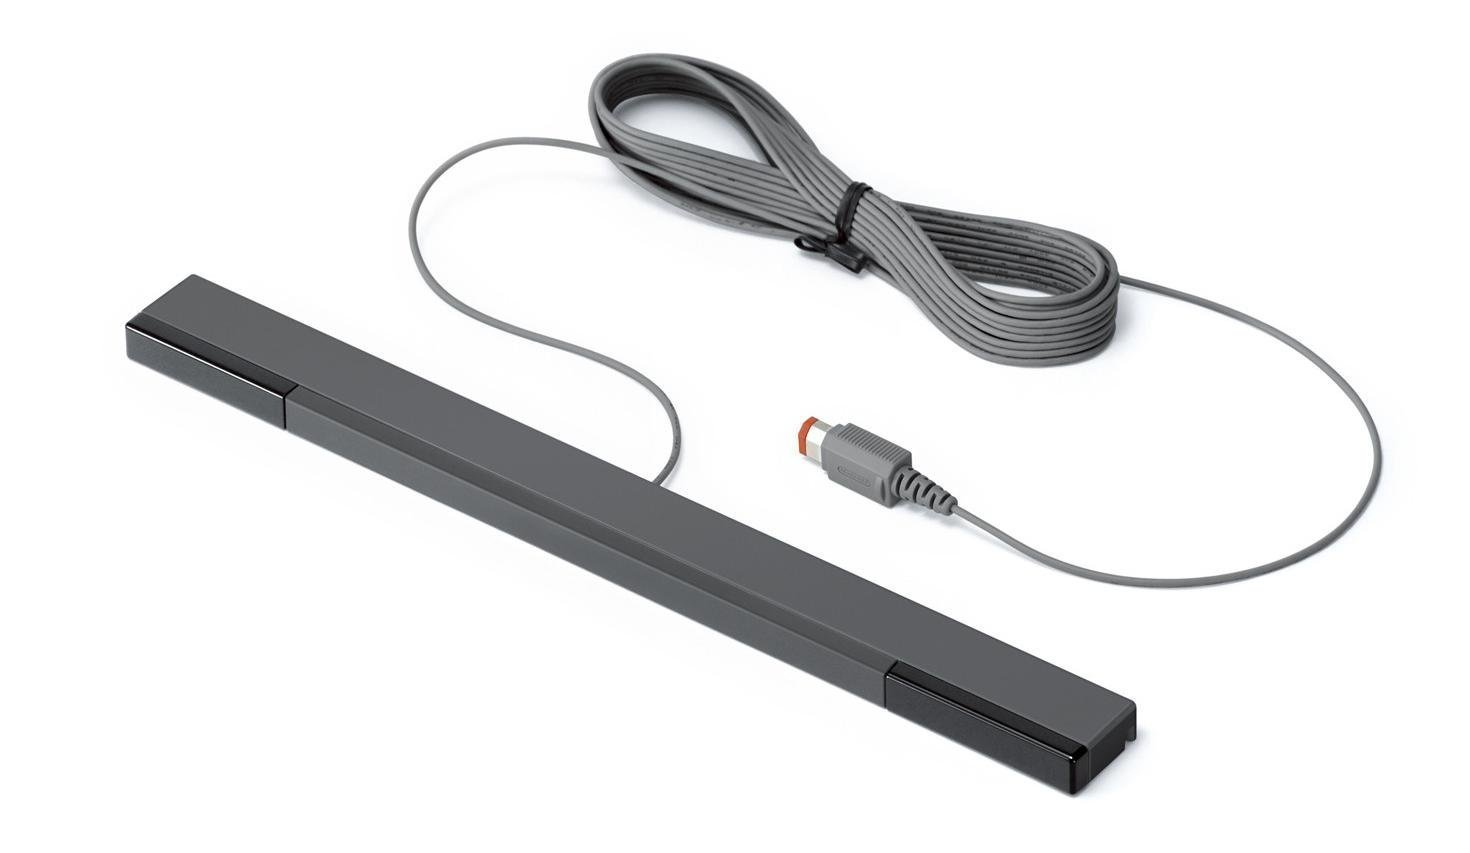 Nintendo Sensor Bar Black Wired Official RVL-014 For Wii (Certified Refurbished)